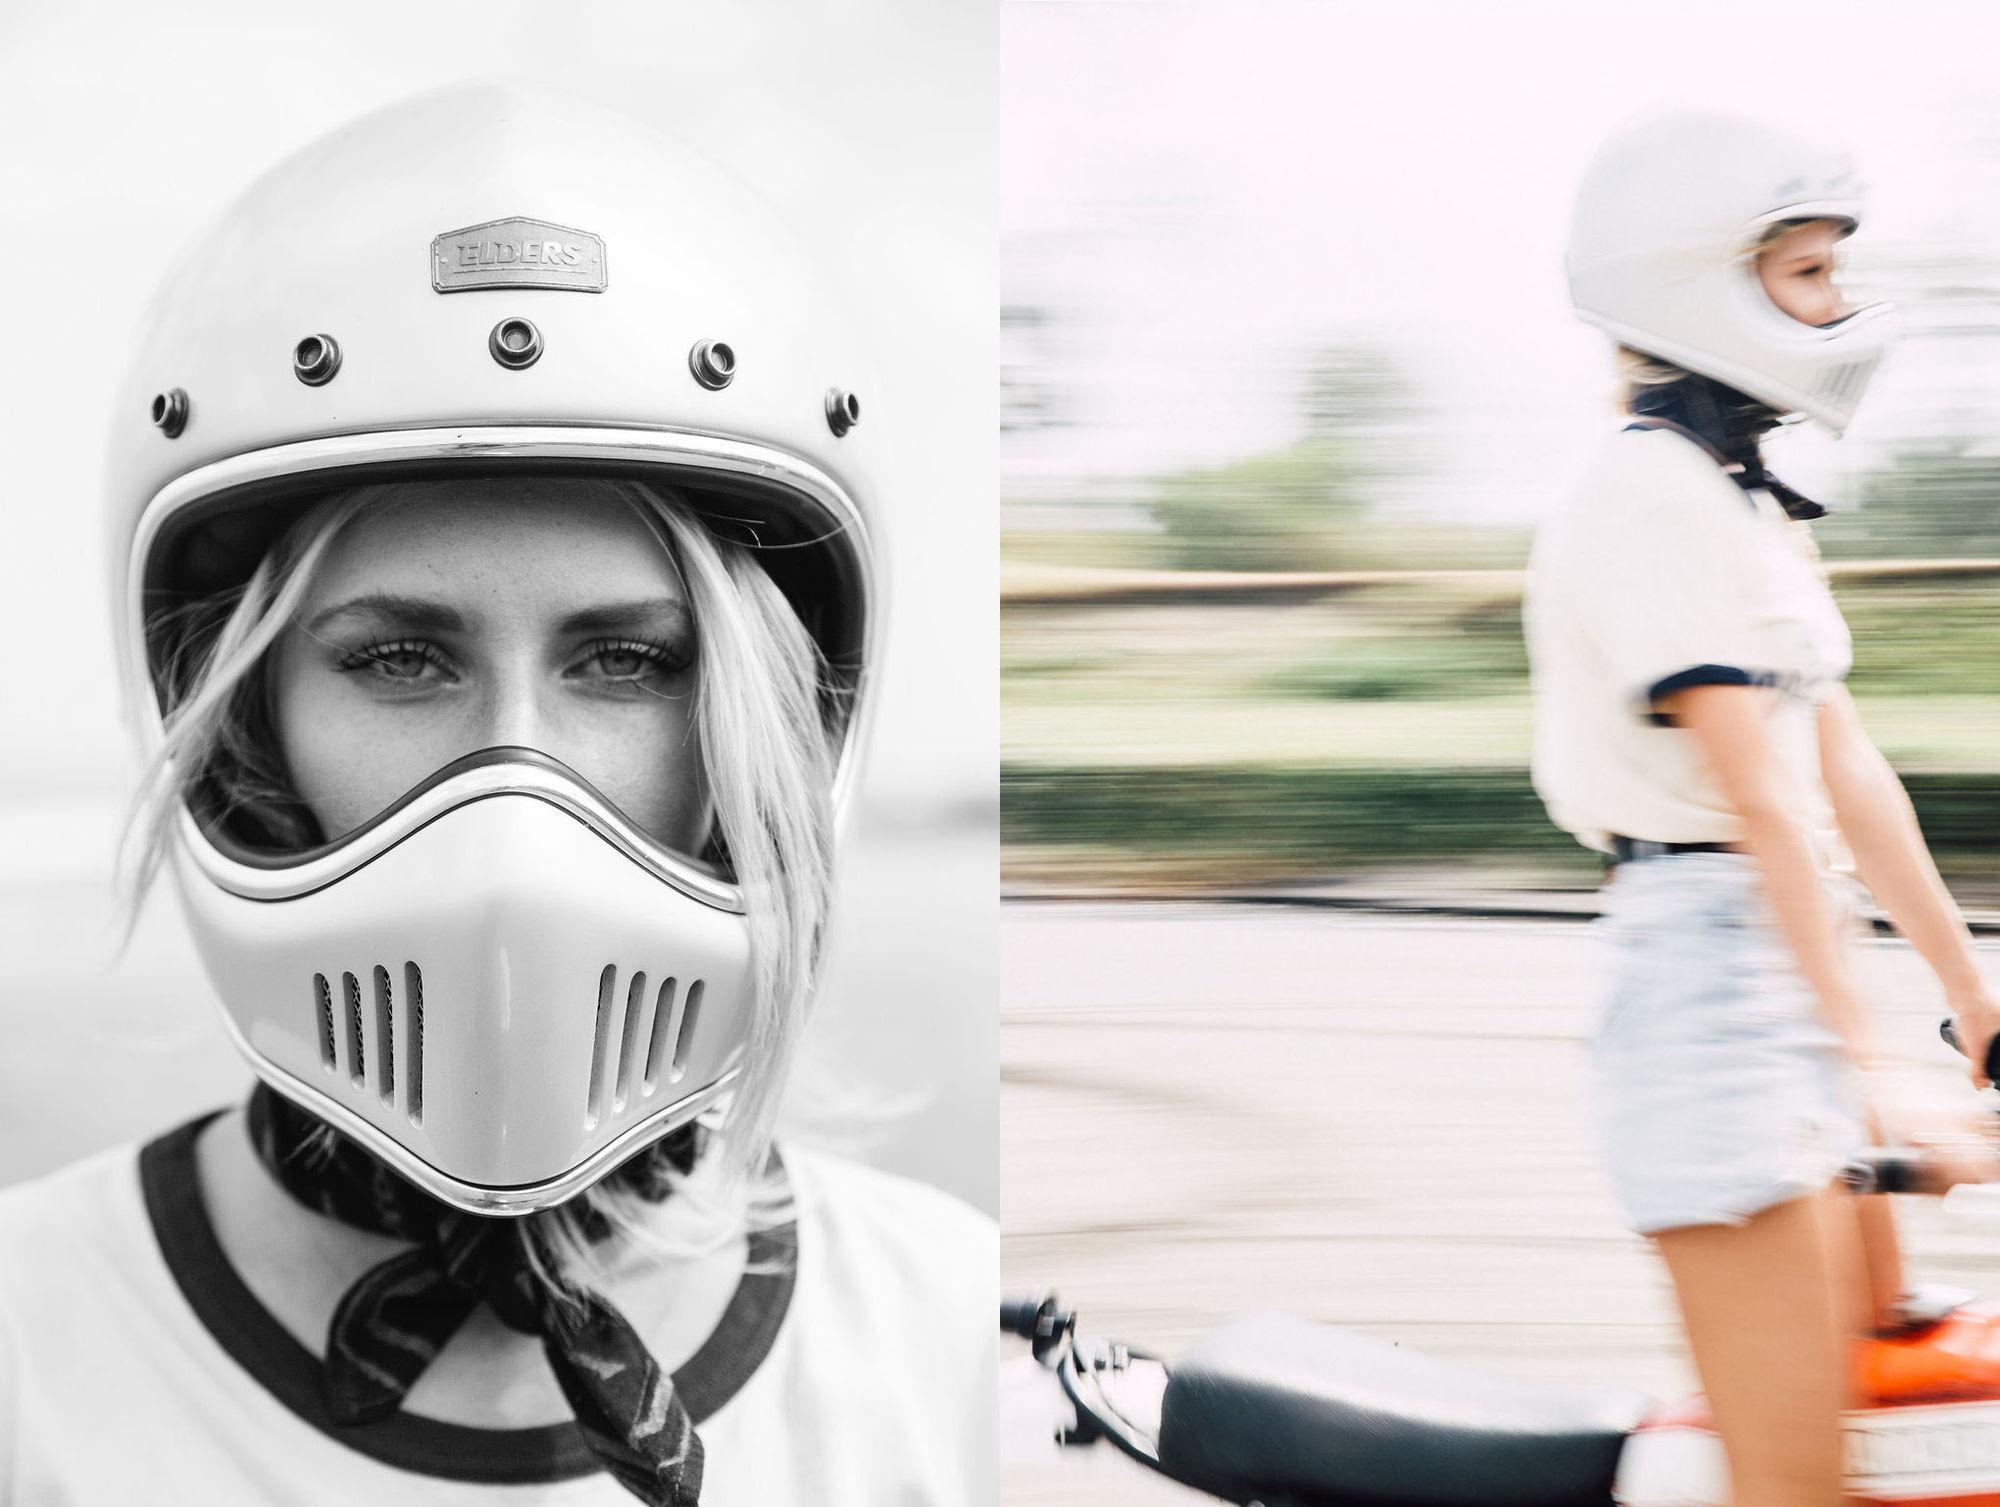 ALYSSA PIZER MANAGEMENT: Moto Girl By Vivian Kim